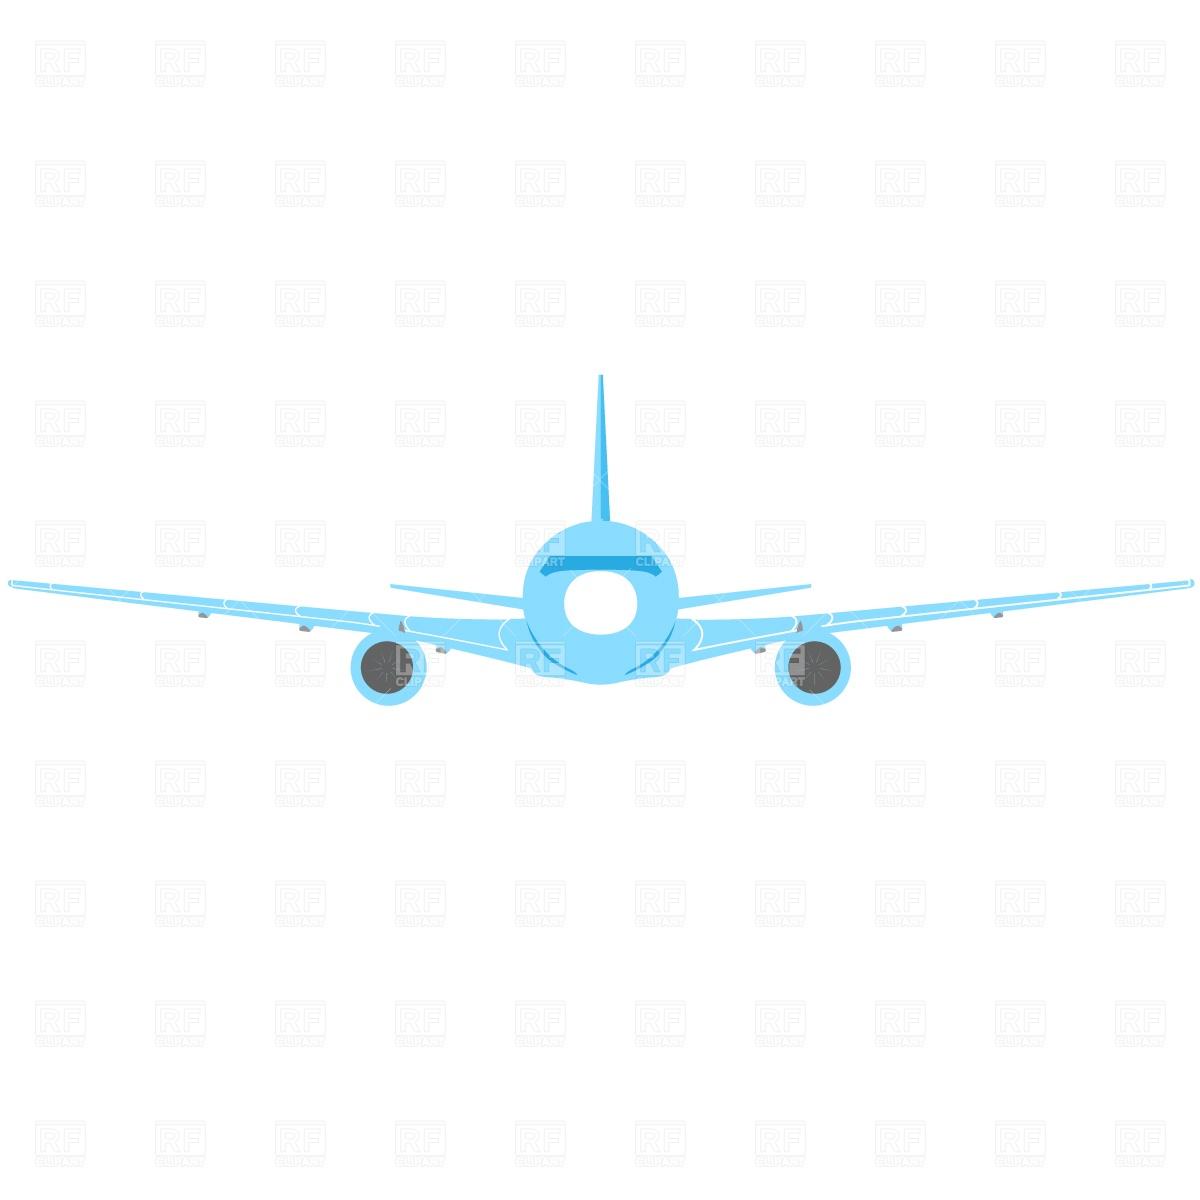 Passenger aircraft, front view Vector Image #722.